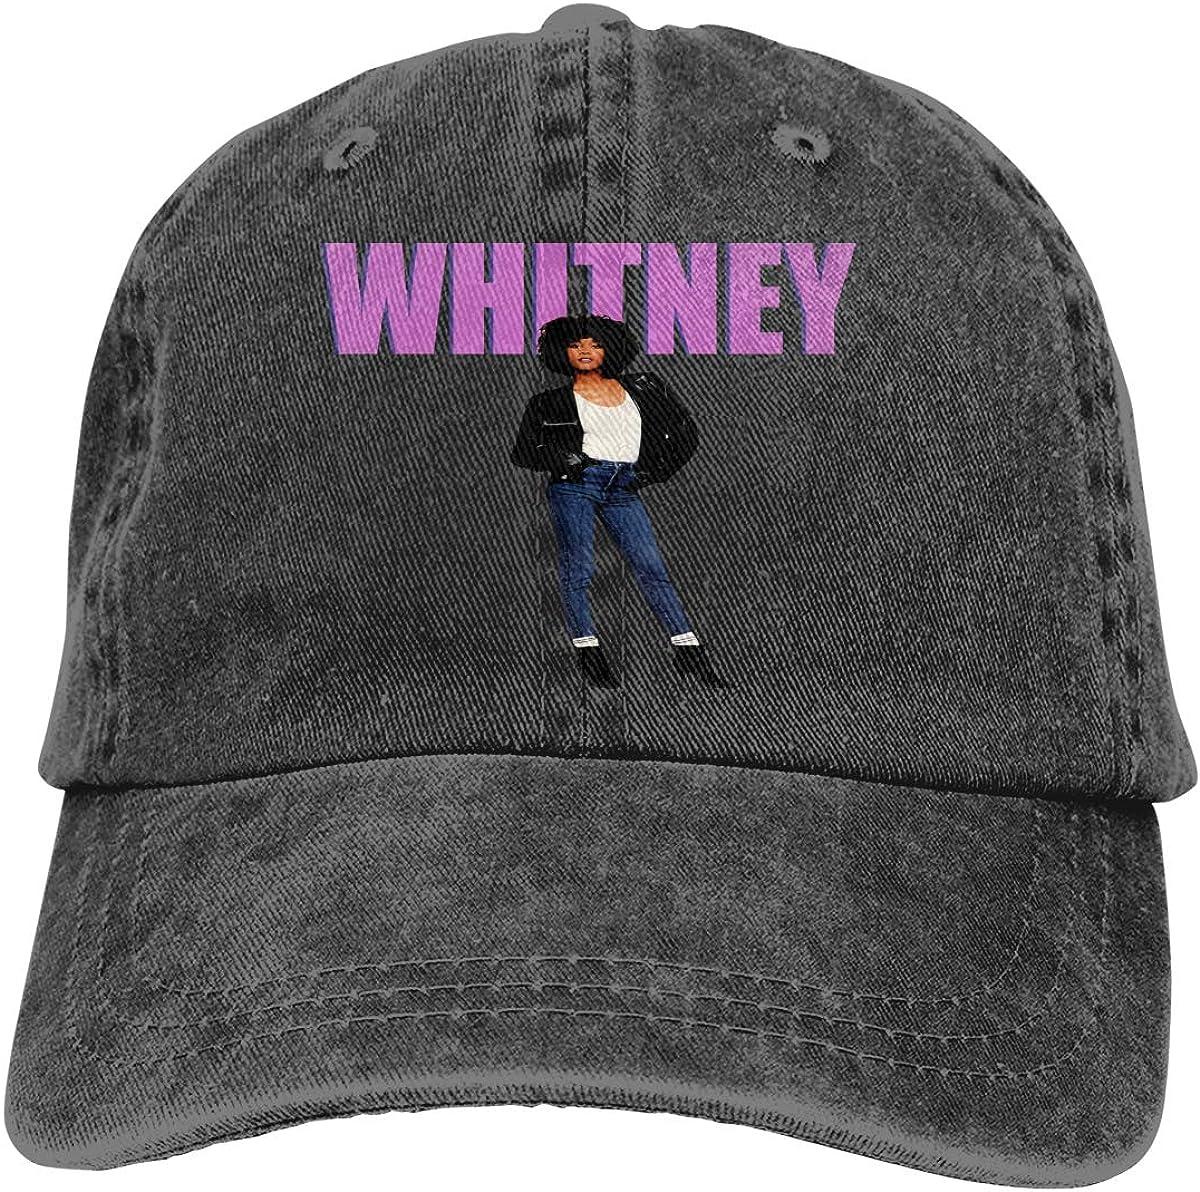 BrandiDobin W-h-itney H-ouston Hat Cotton Washed Denim Hat Adjustable Baseball Cap Unisex One Size